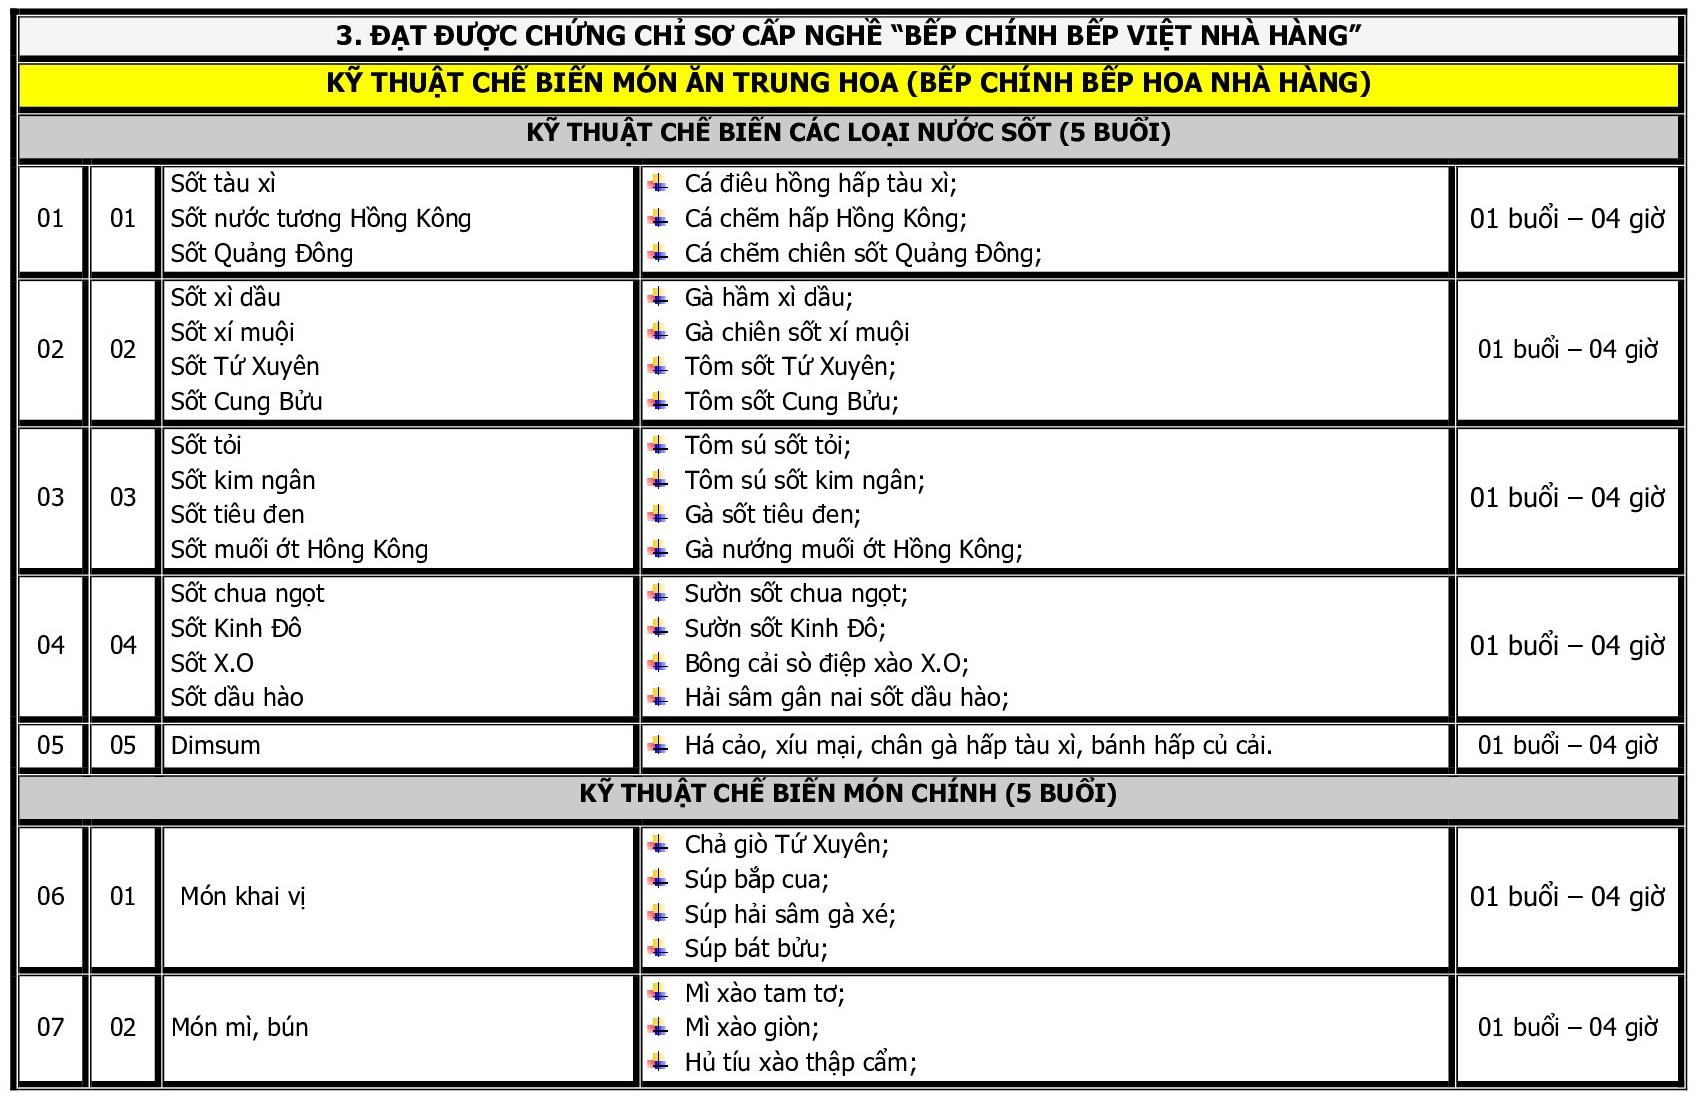 CT DAO TAO THUC HANH BAC TRUNG CAP_p010